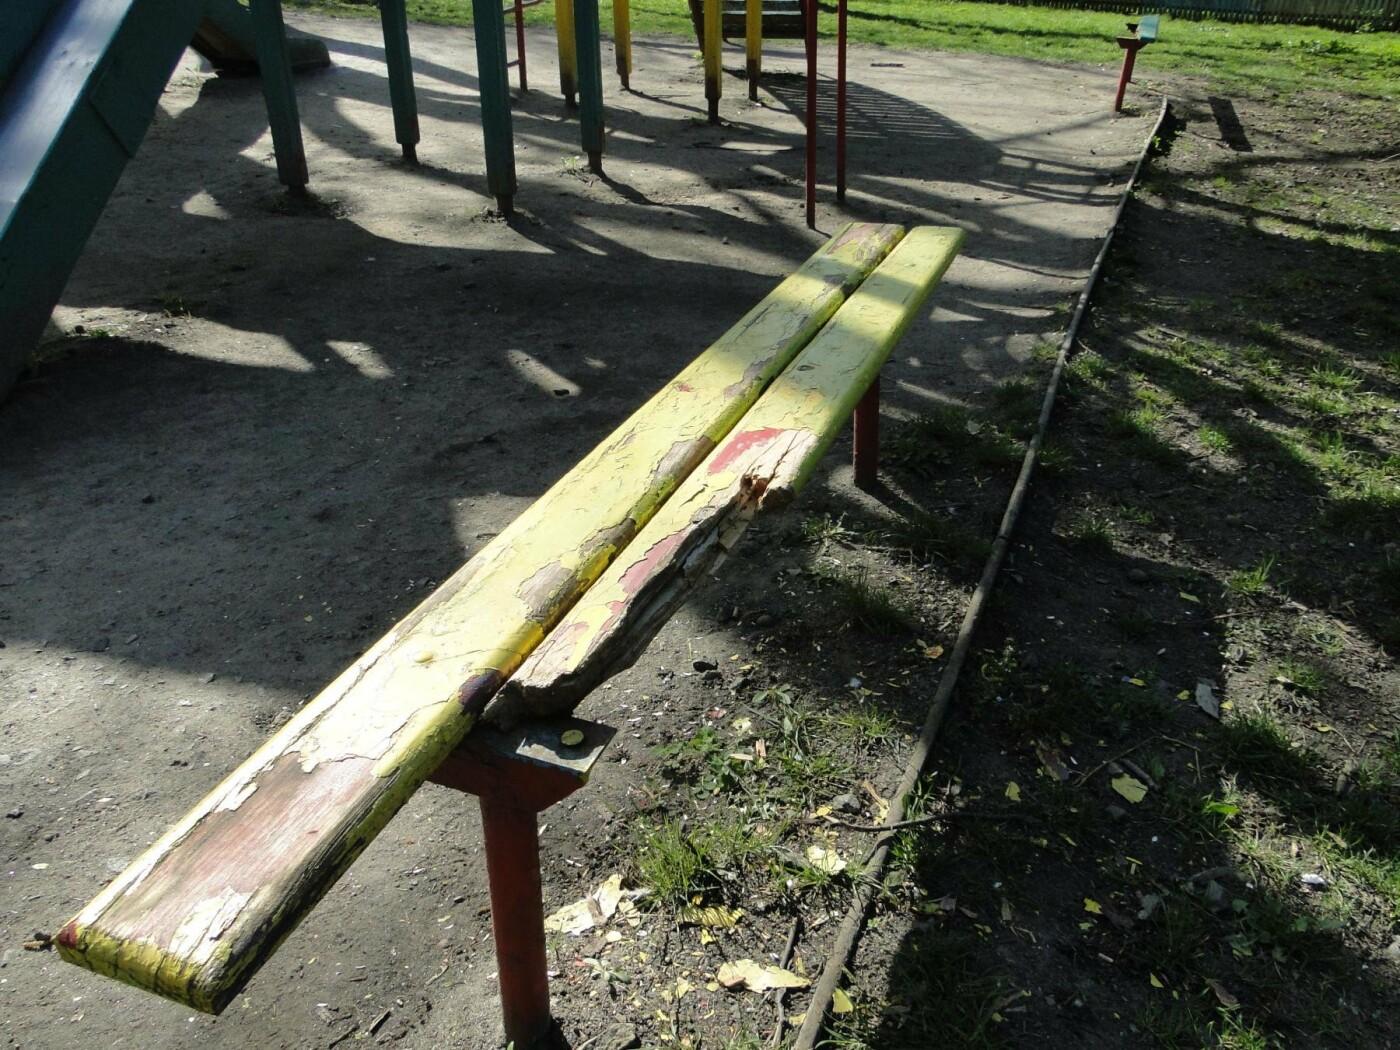 Травмоване дитинство: де зачаїлася небезпека на дитячому майданчику в парку Чекмана. ФОТО, фото-15